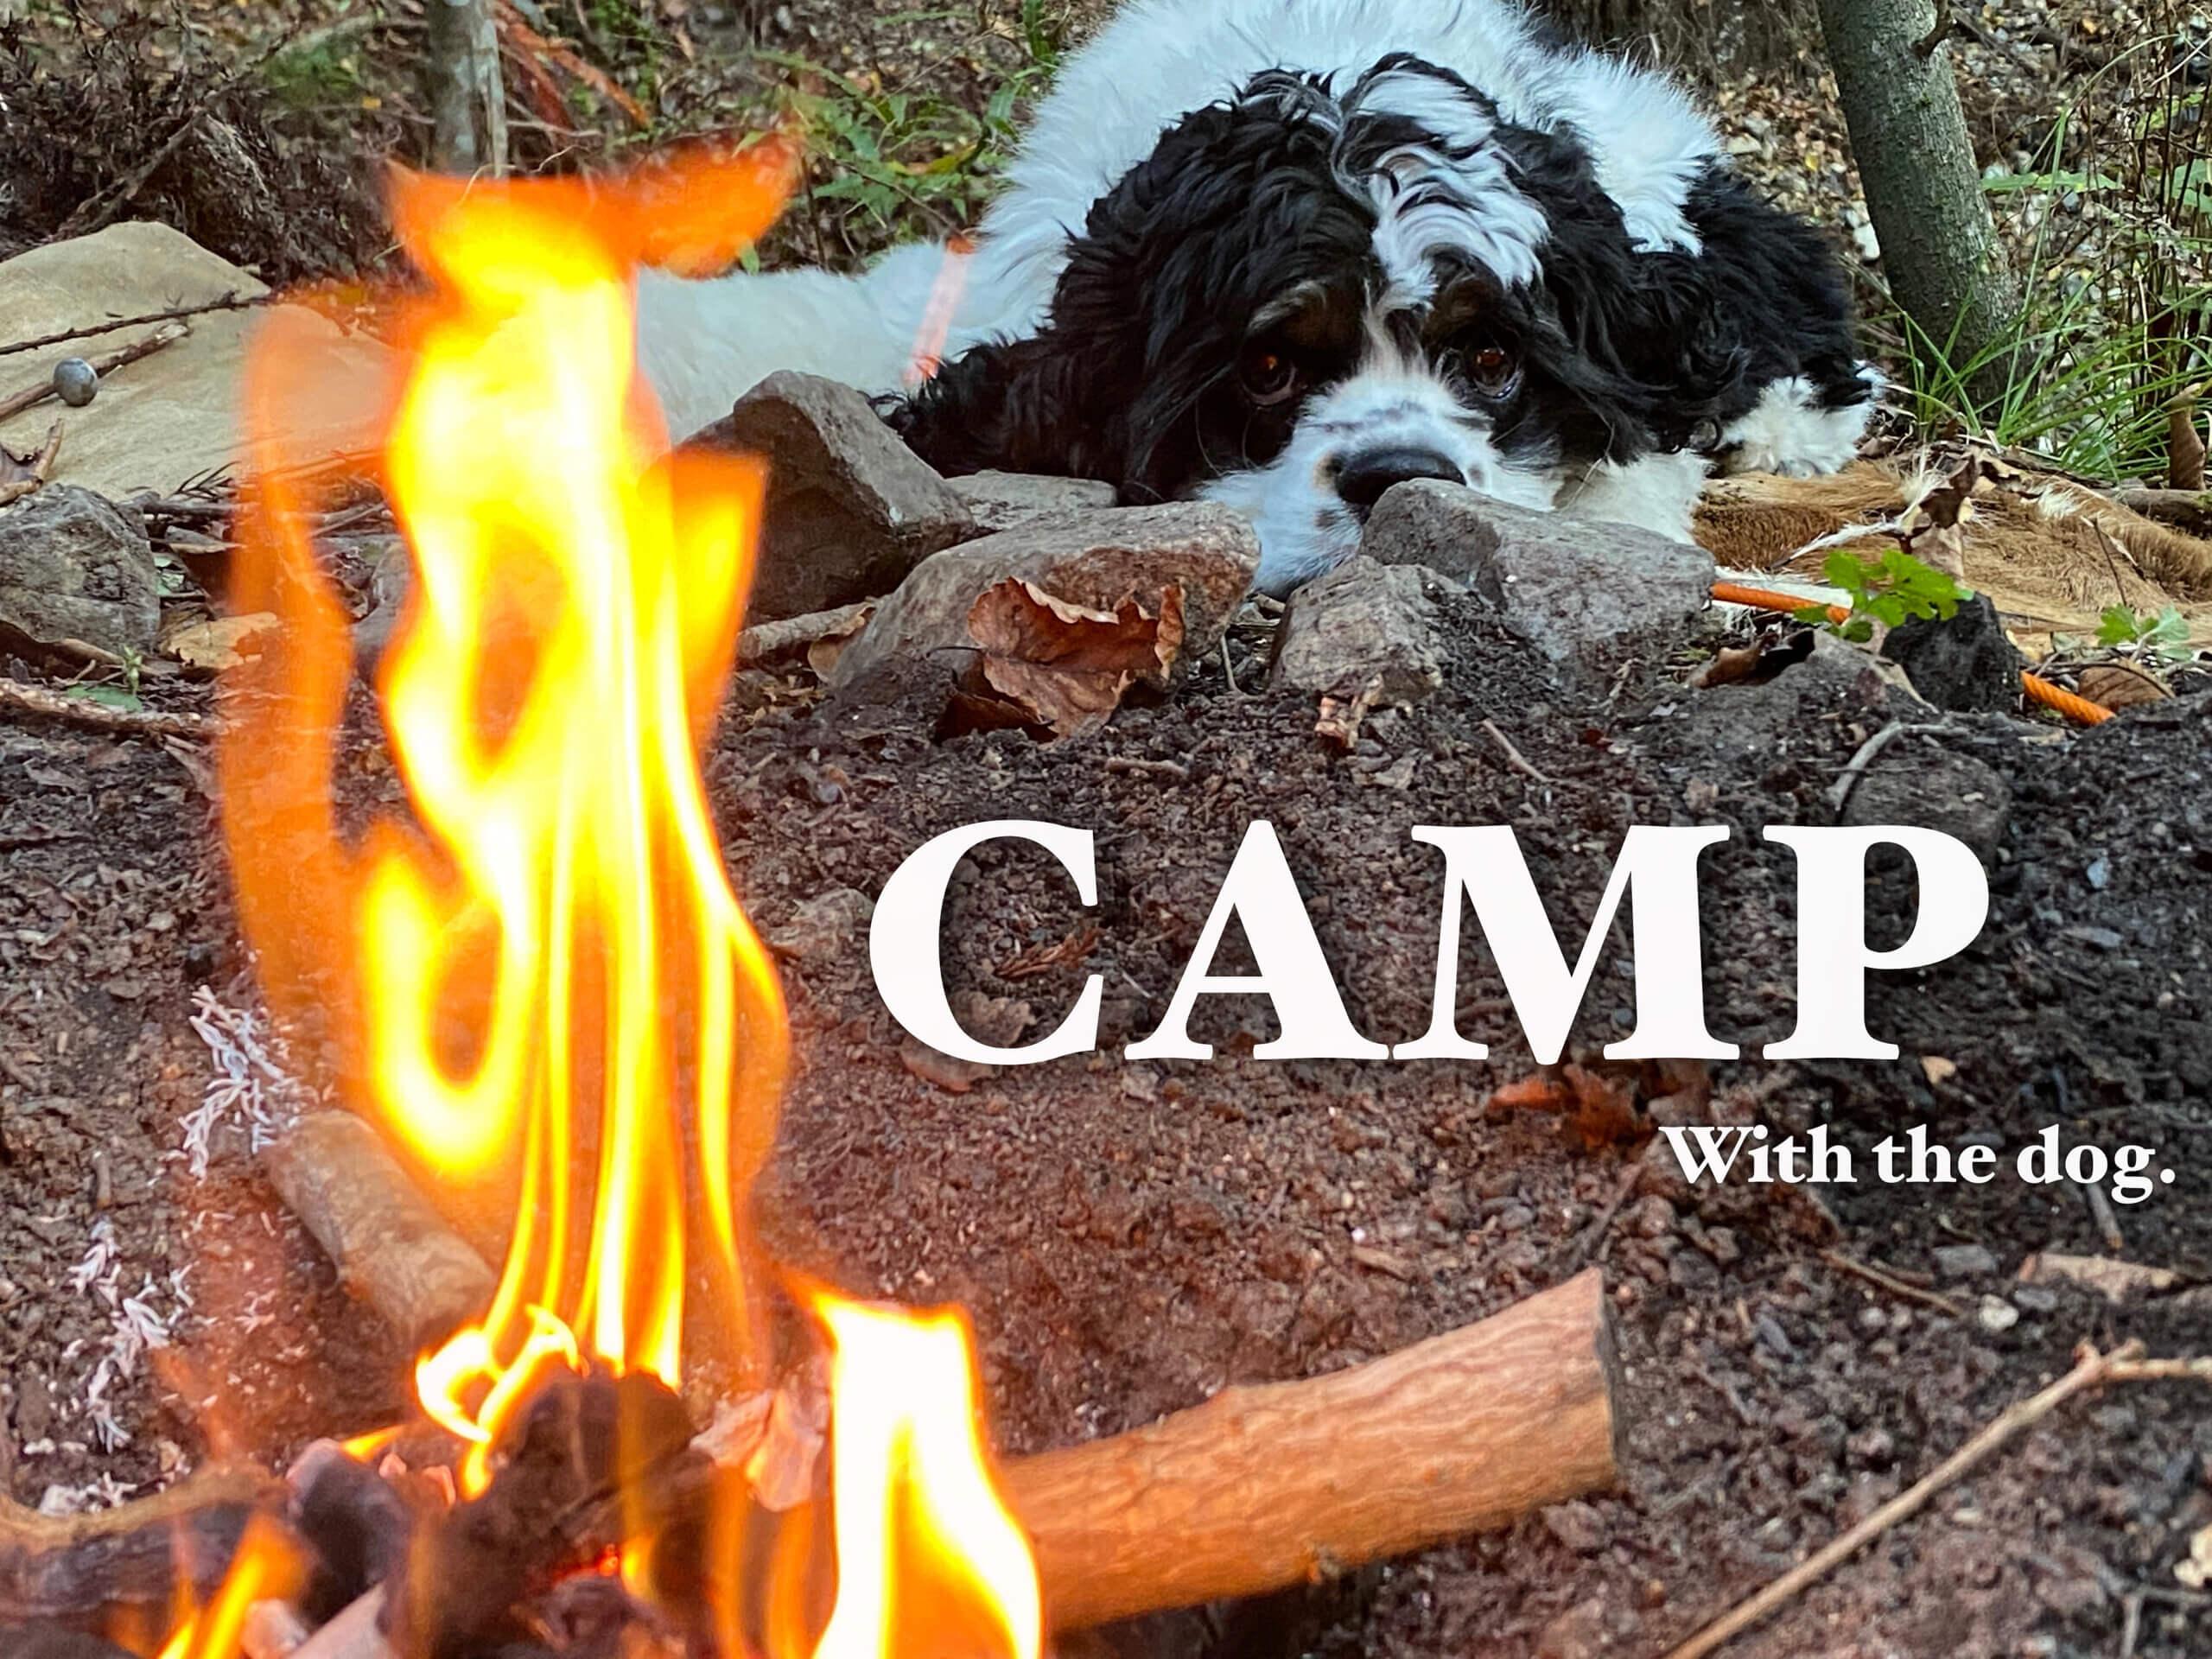 Campail調査!ワンちゃんと行けるキャンプ場リスト!